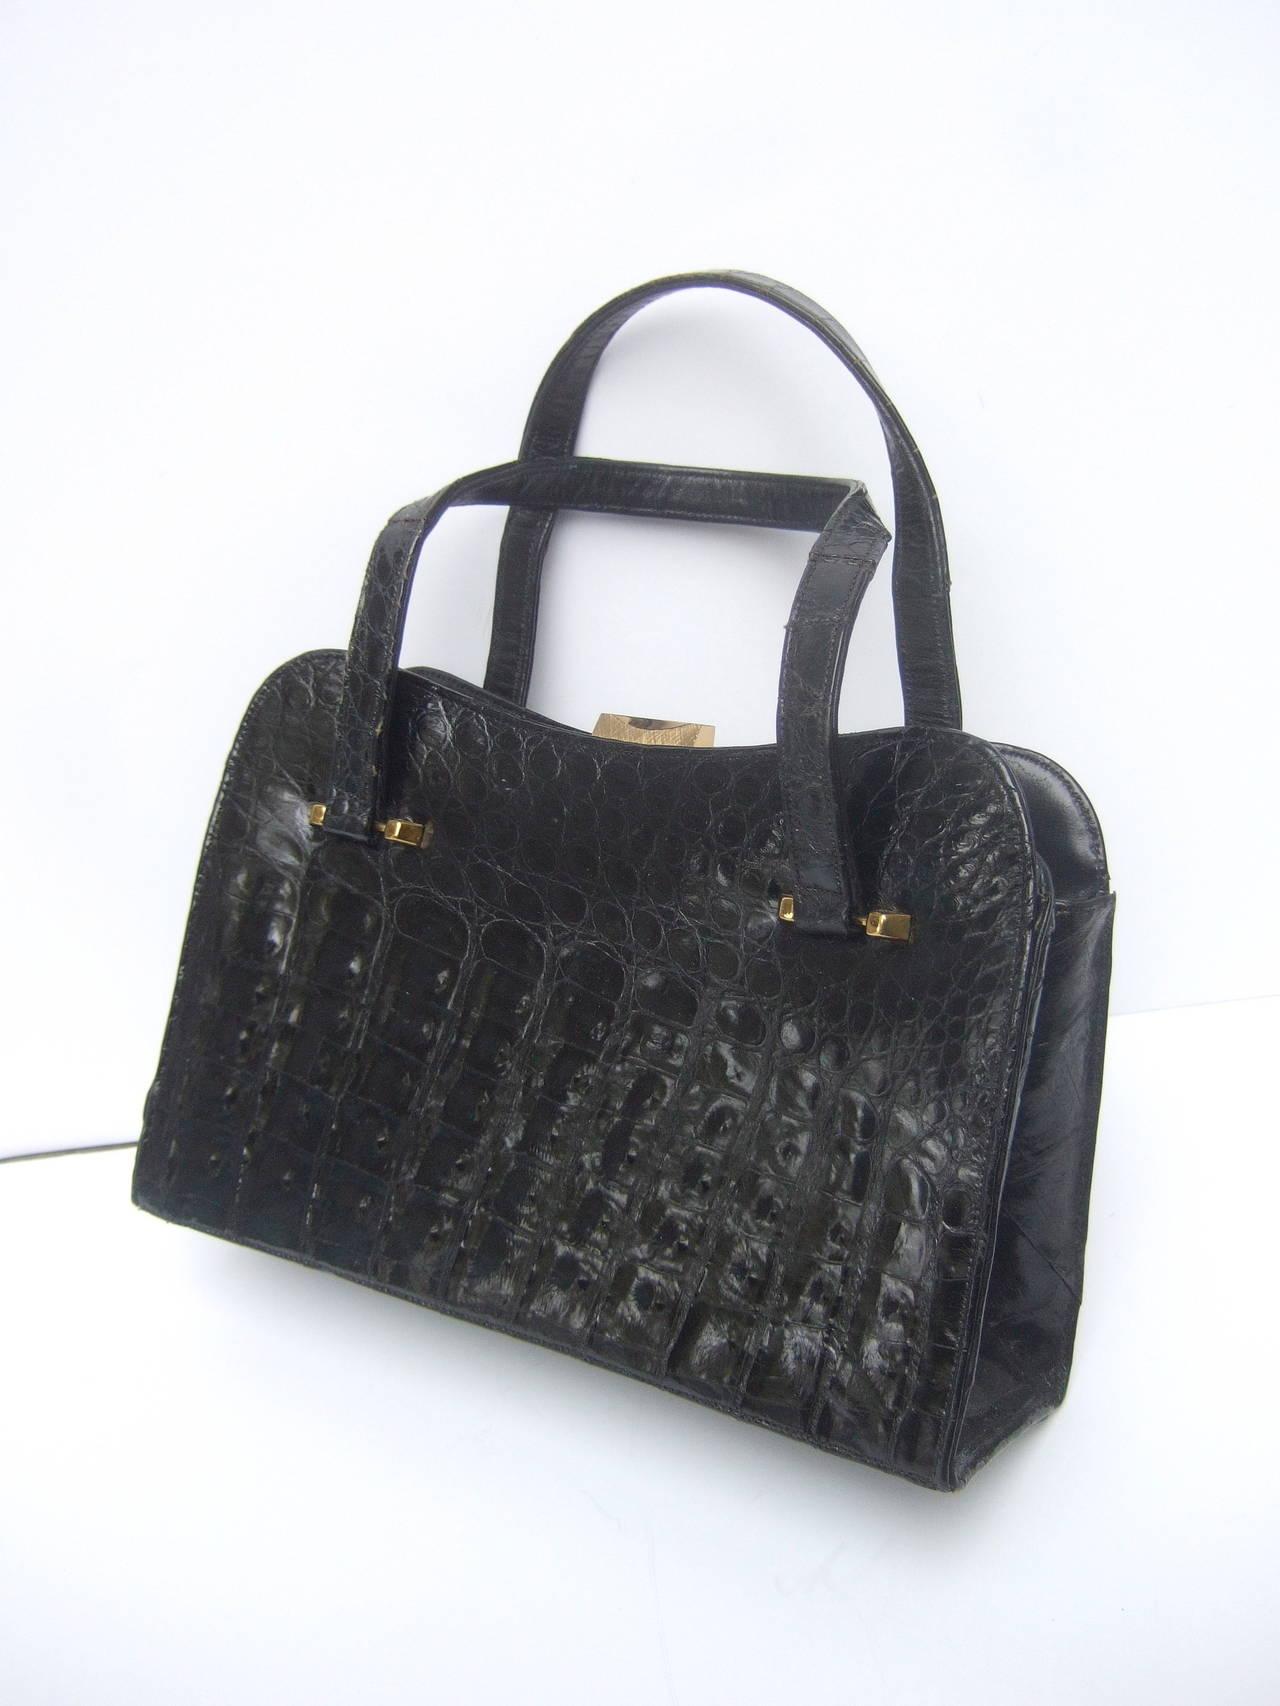 Exotic Sleek Black Alligator Handbag c 1960 4